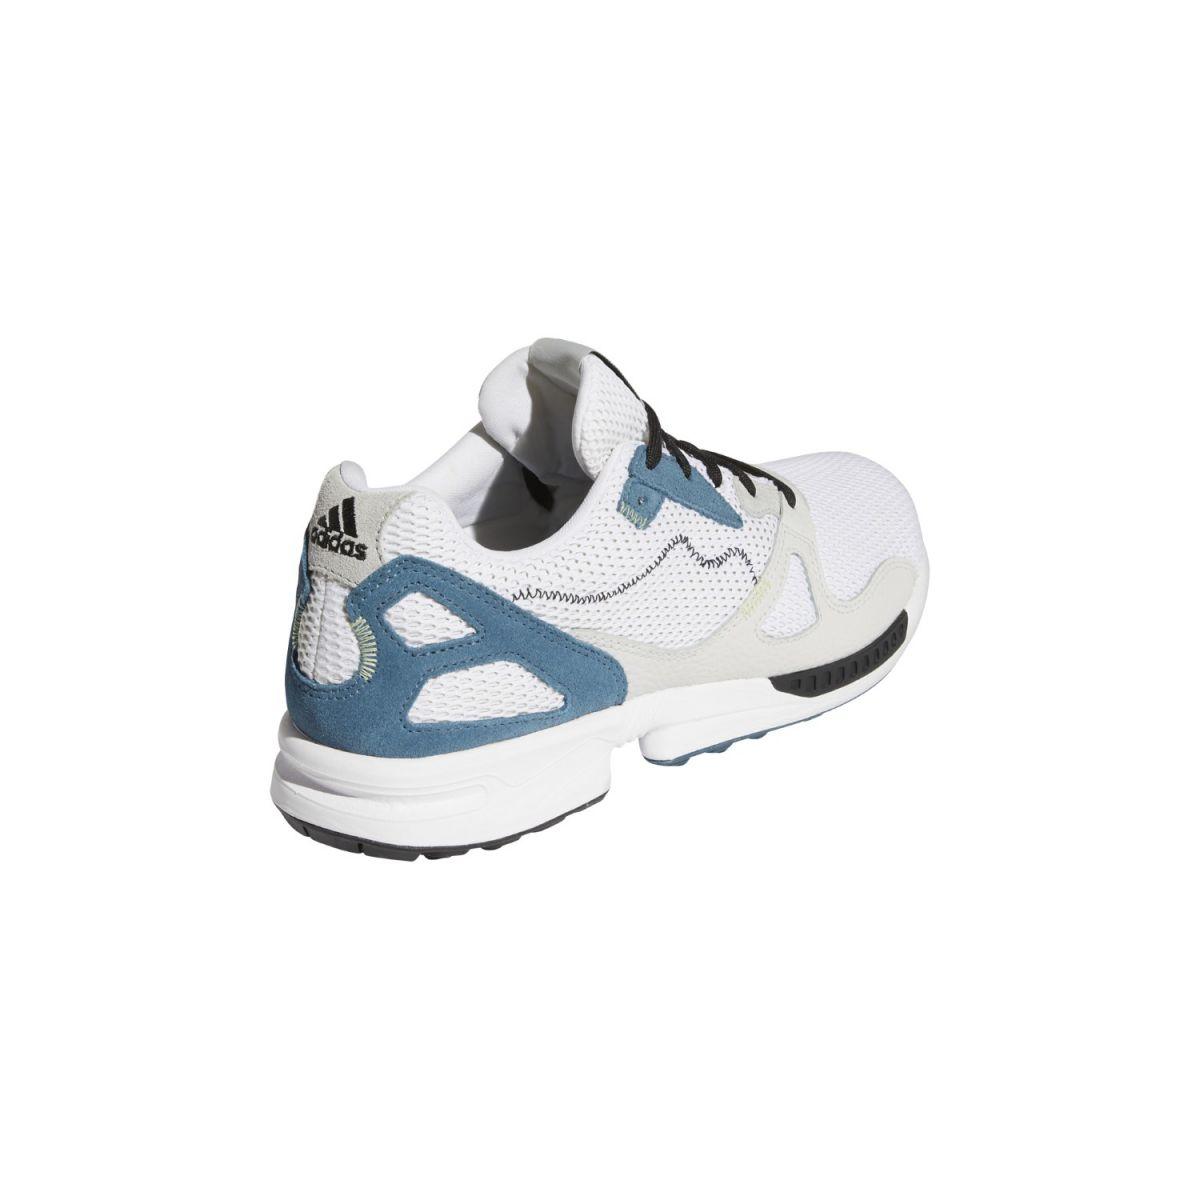 adidas adicross zx primeblue white blue 38